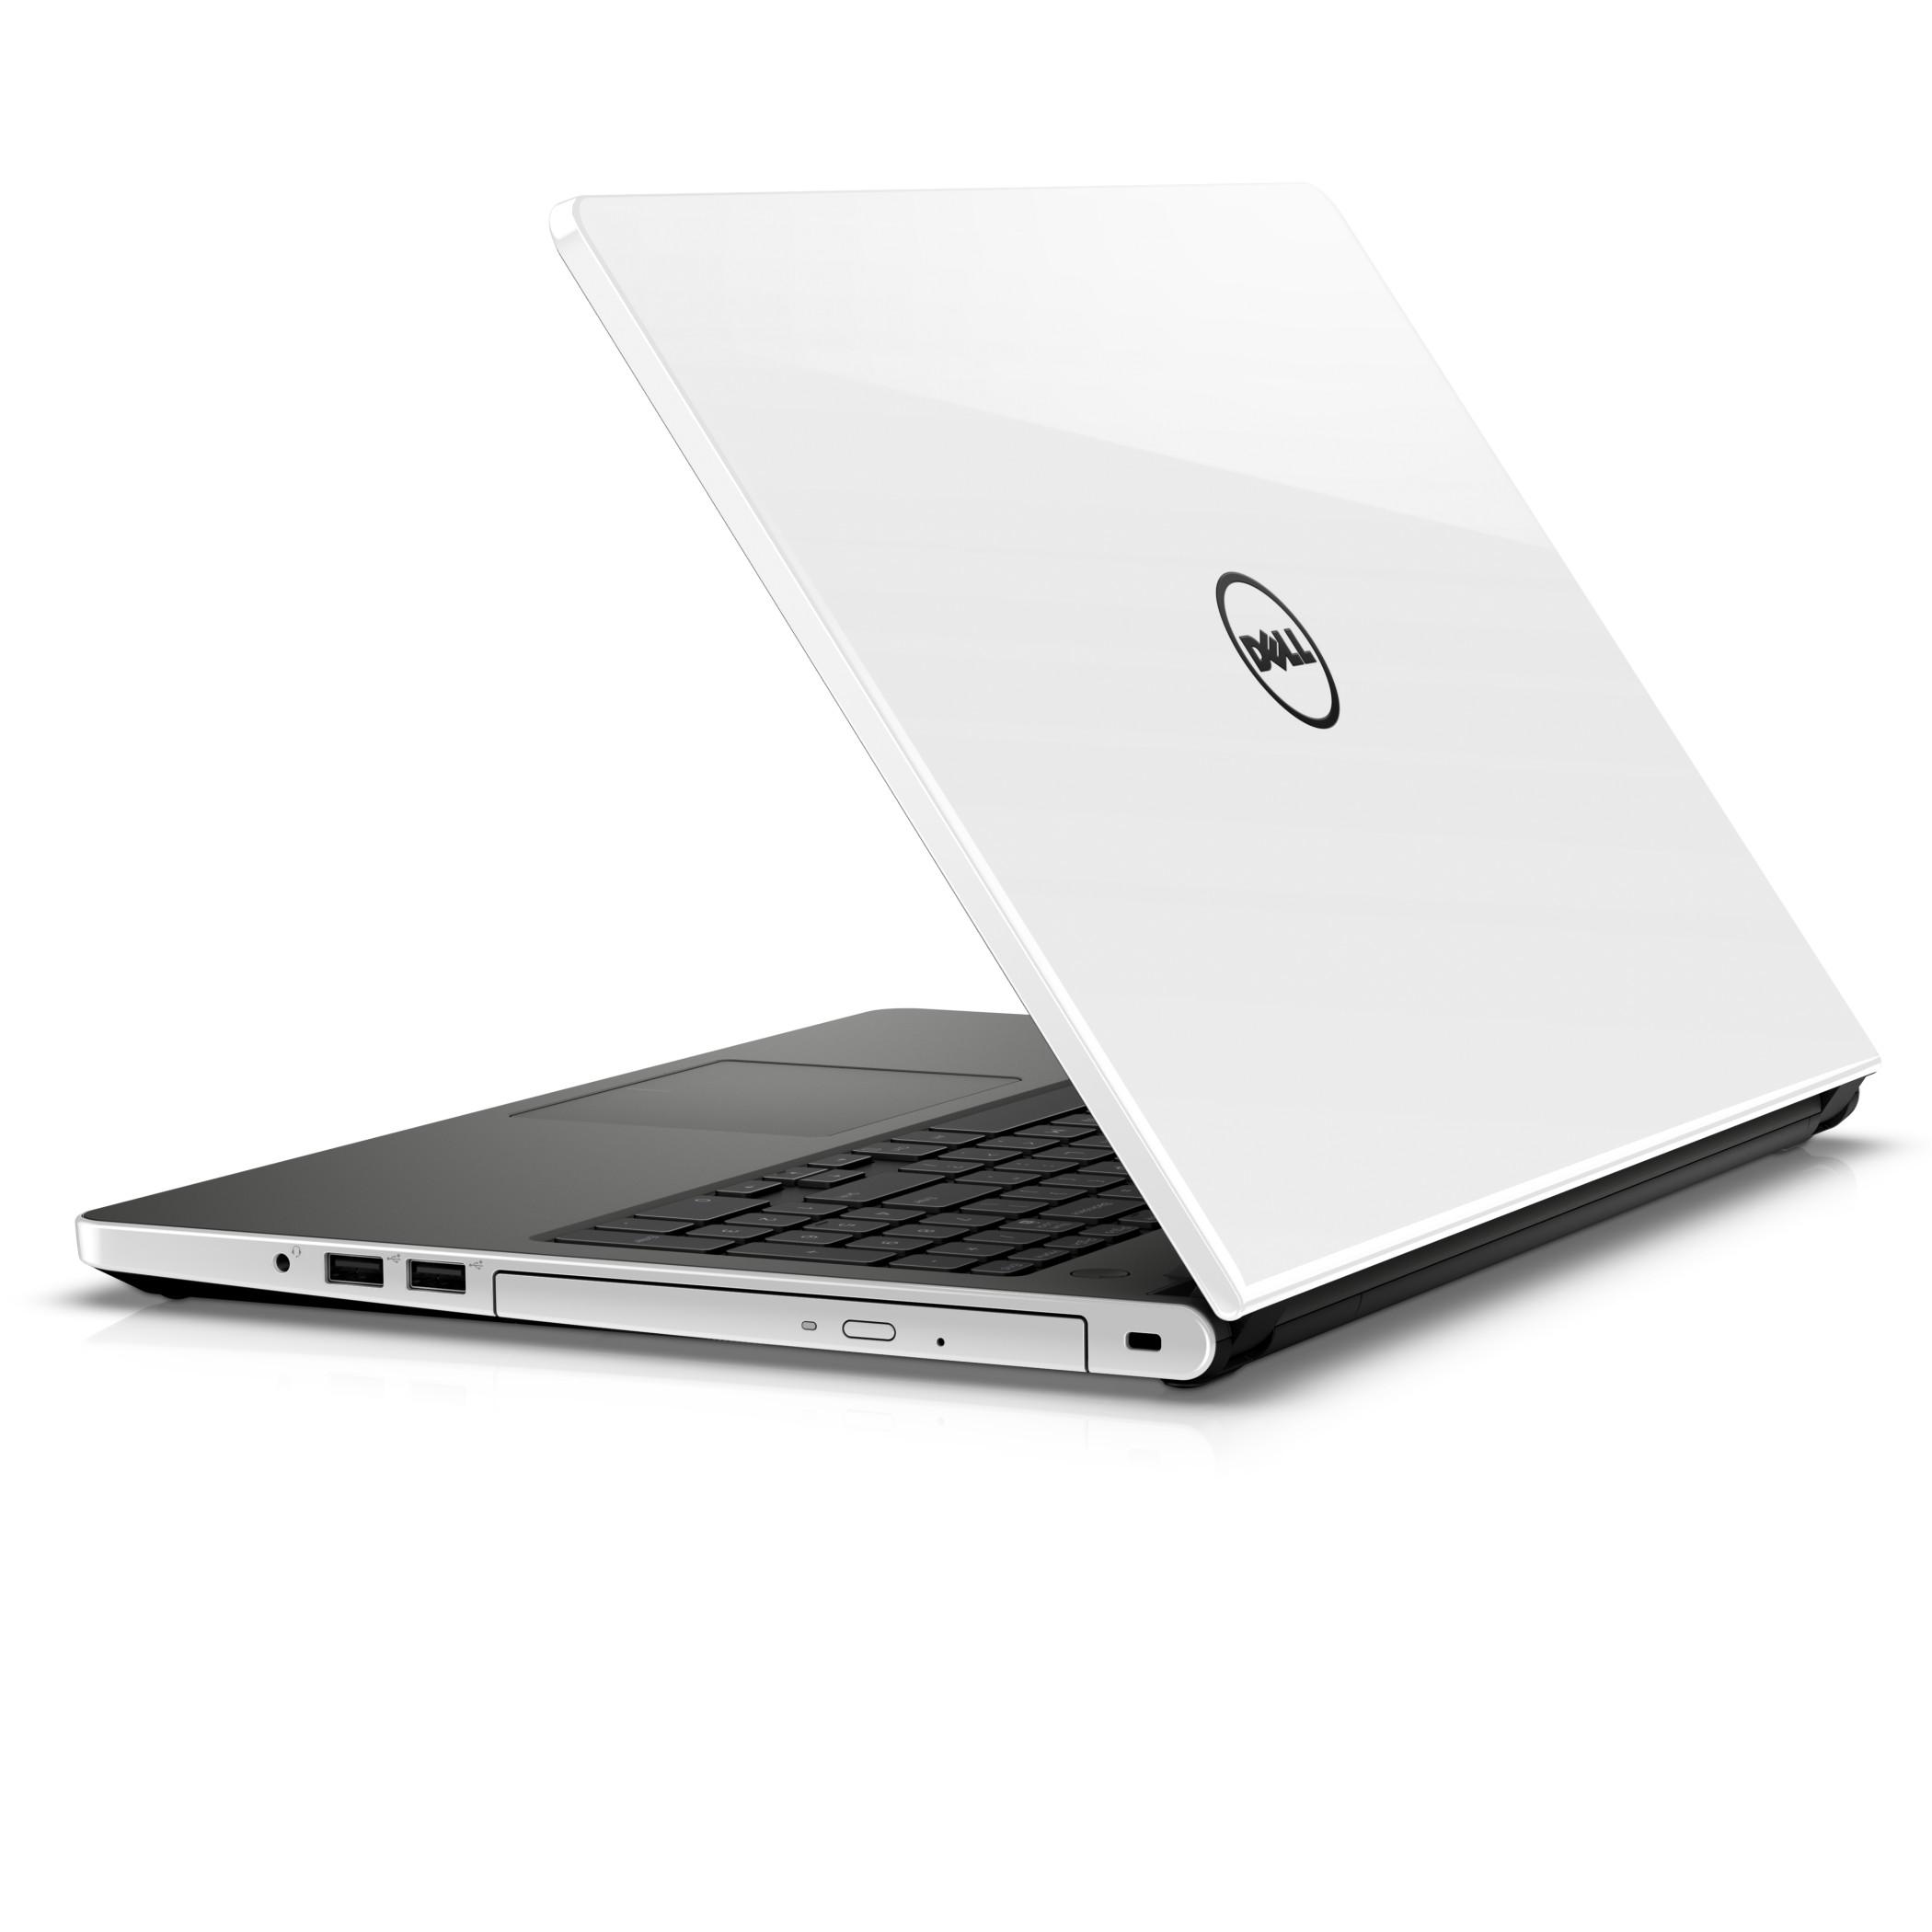 "Dell Inspiron 15 5558 15.6"" HD i3-5005U/4GB/1TB/920M/HDMI/USB/RJ45/WIFI/BT/MCR/W10/2NBD/Bílý"